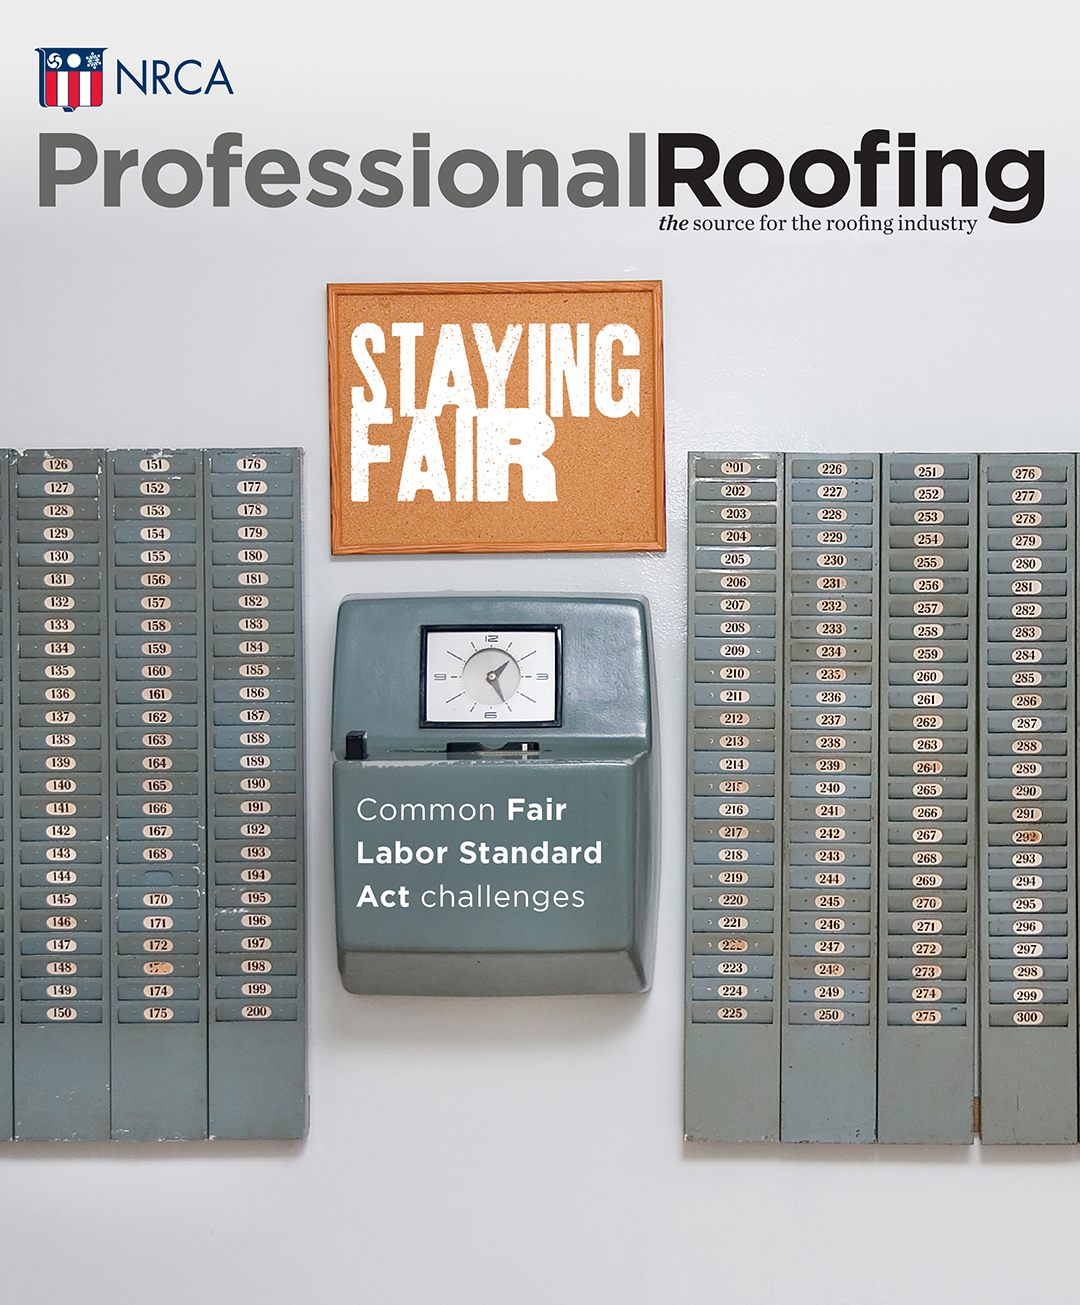 Professional Roofing Magazine 7/1/2020